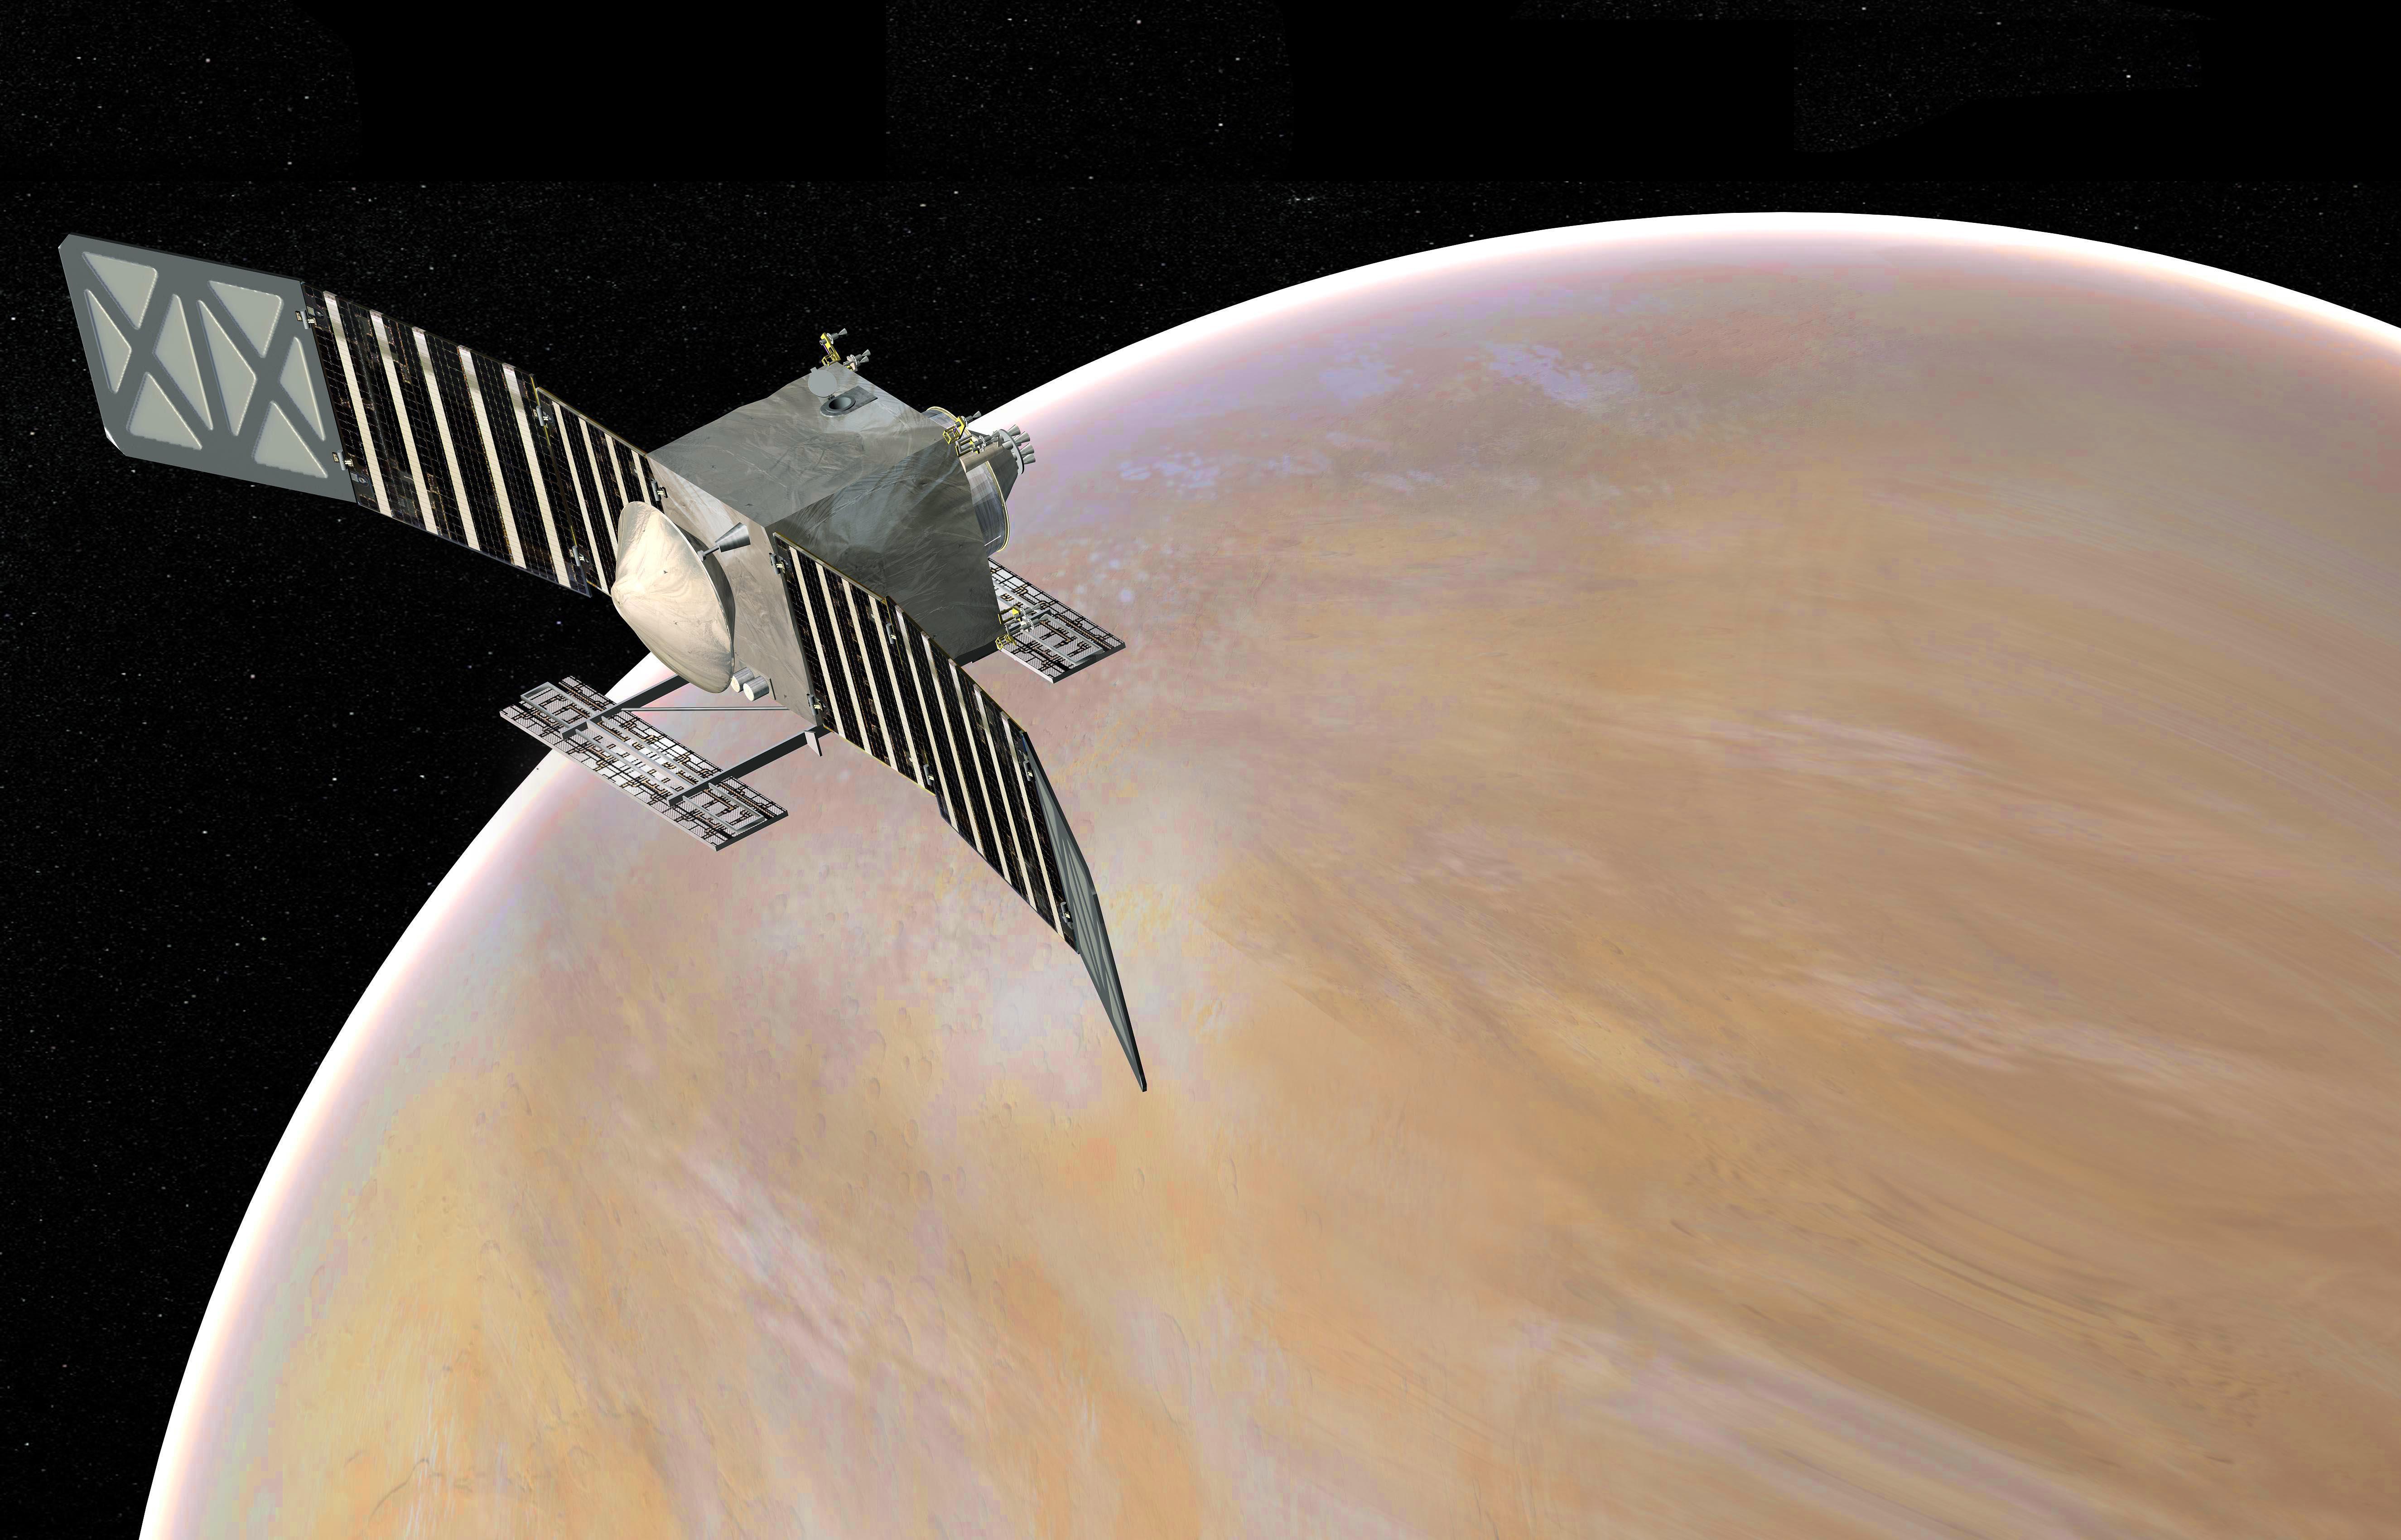 Artist's concept of VERITAS. Source: NASA/JPL-Caltech